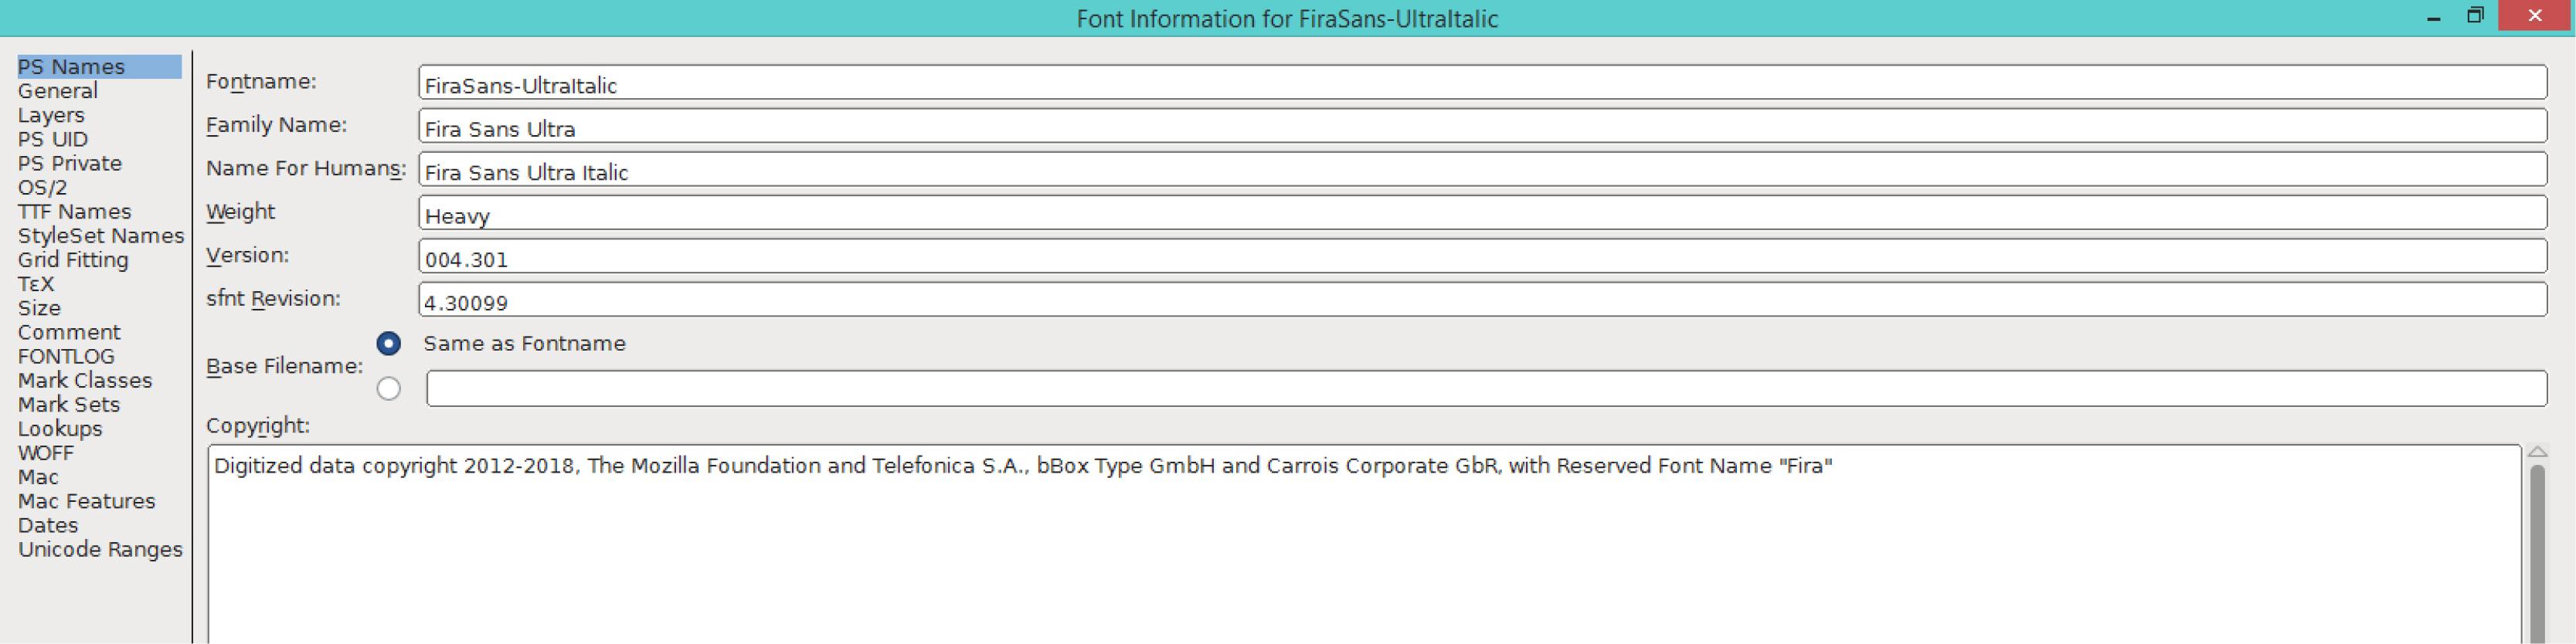 Fira Sans Ultra Italic (PS)